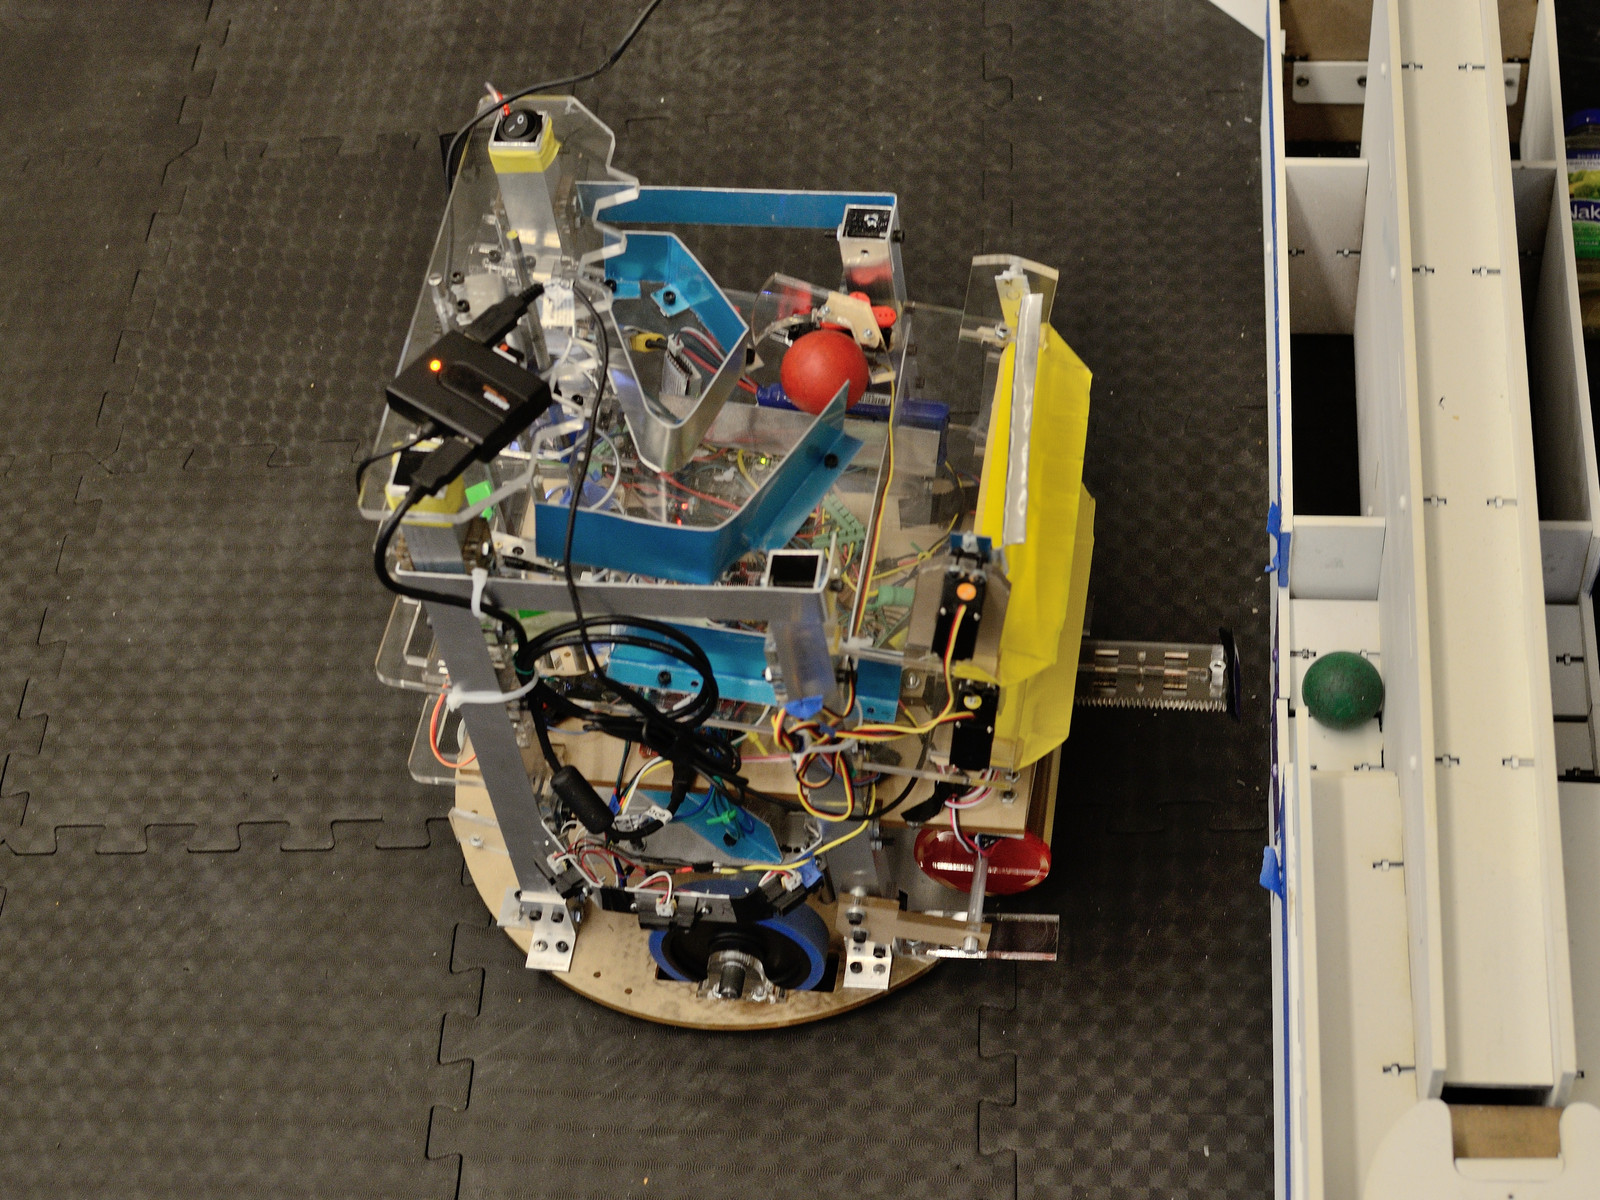 sshbot tape ball grabber maslab mit